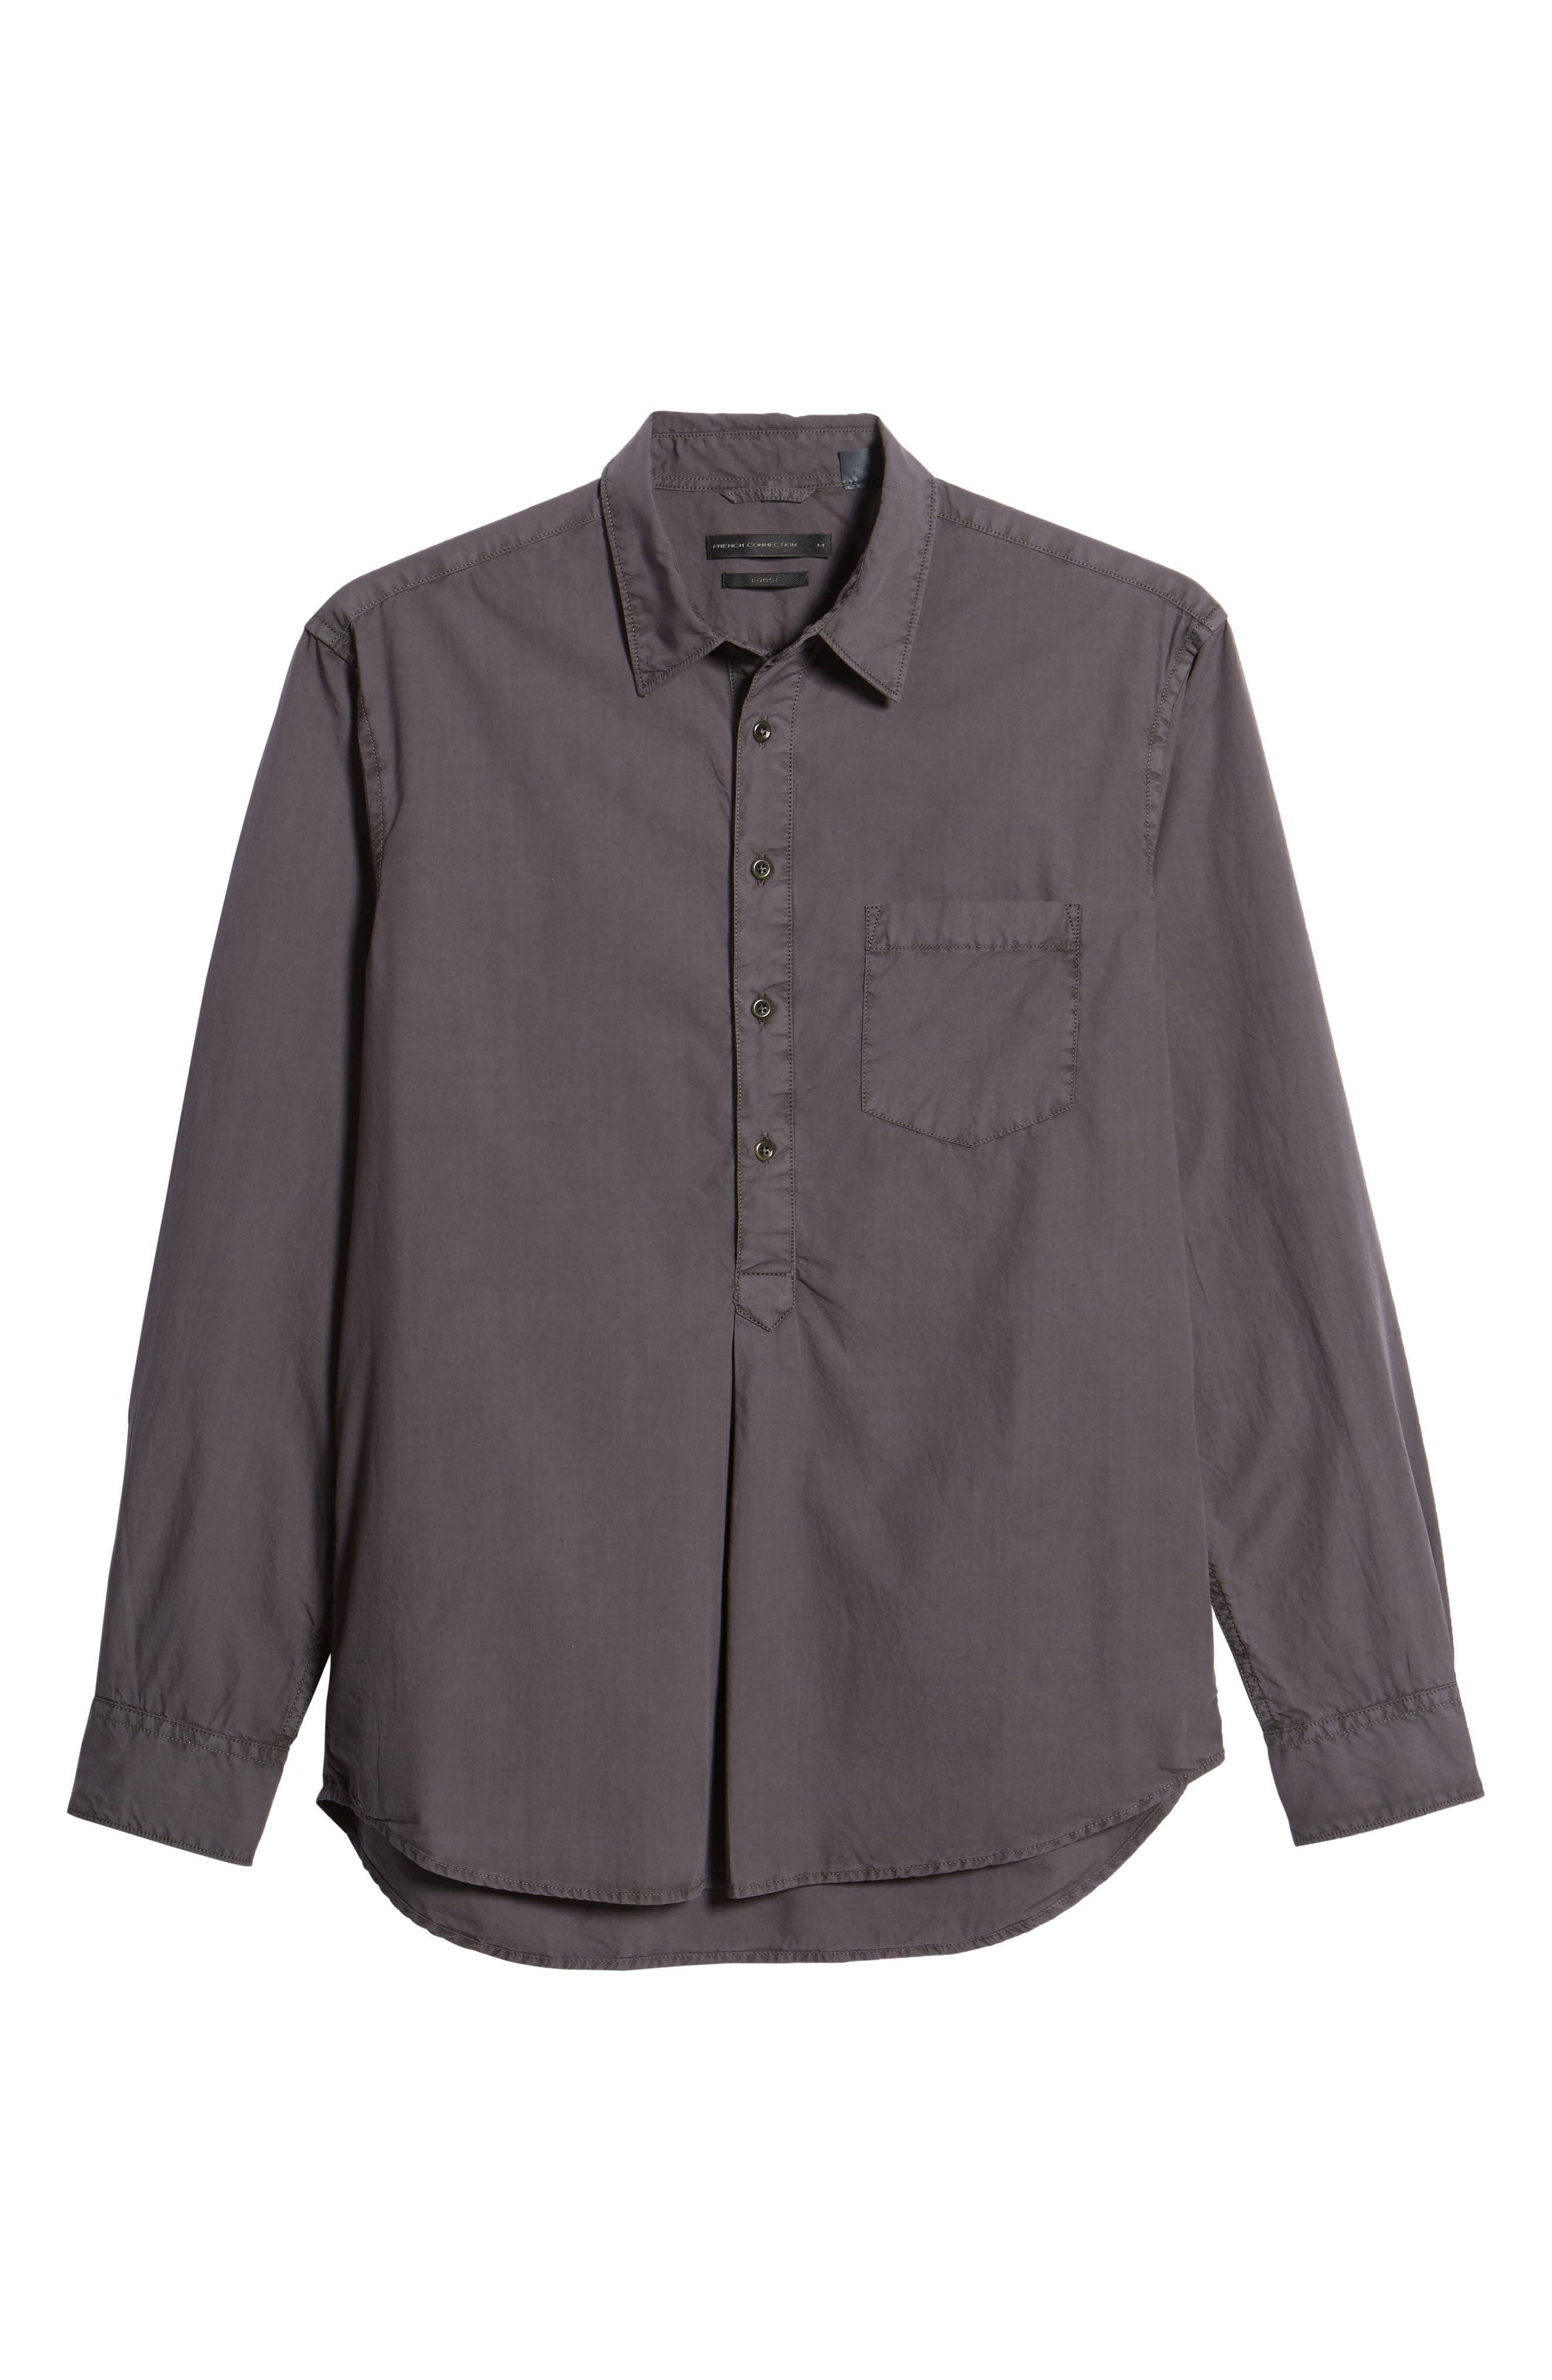 Regular Fit Garment Dyed Poplin Sport Shirt,                             Alternate thumbnail 6, color,                             Workwear Grey